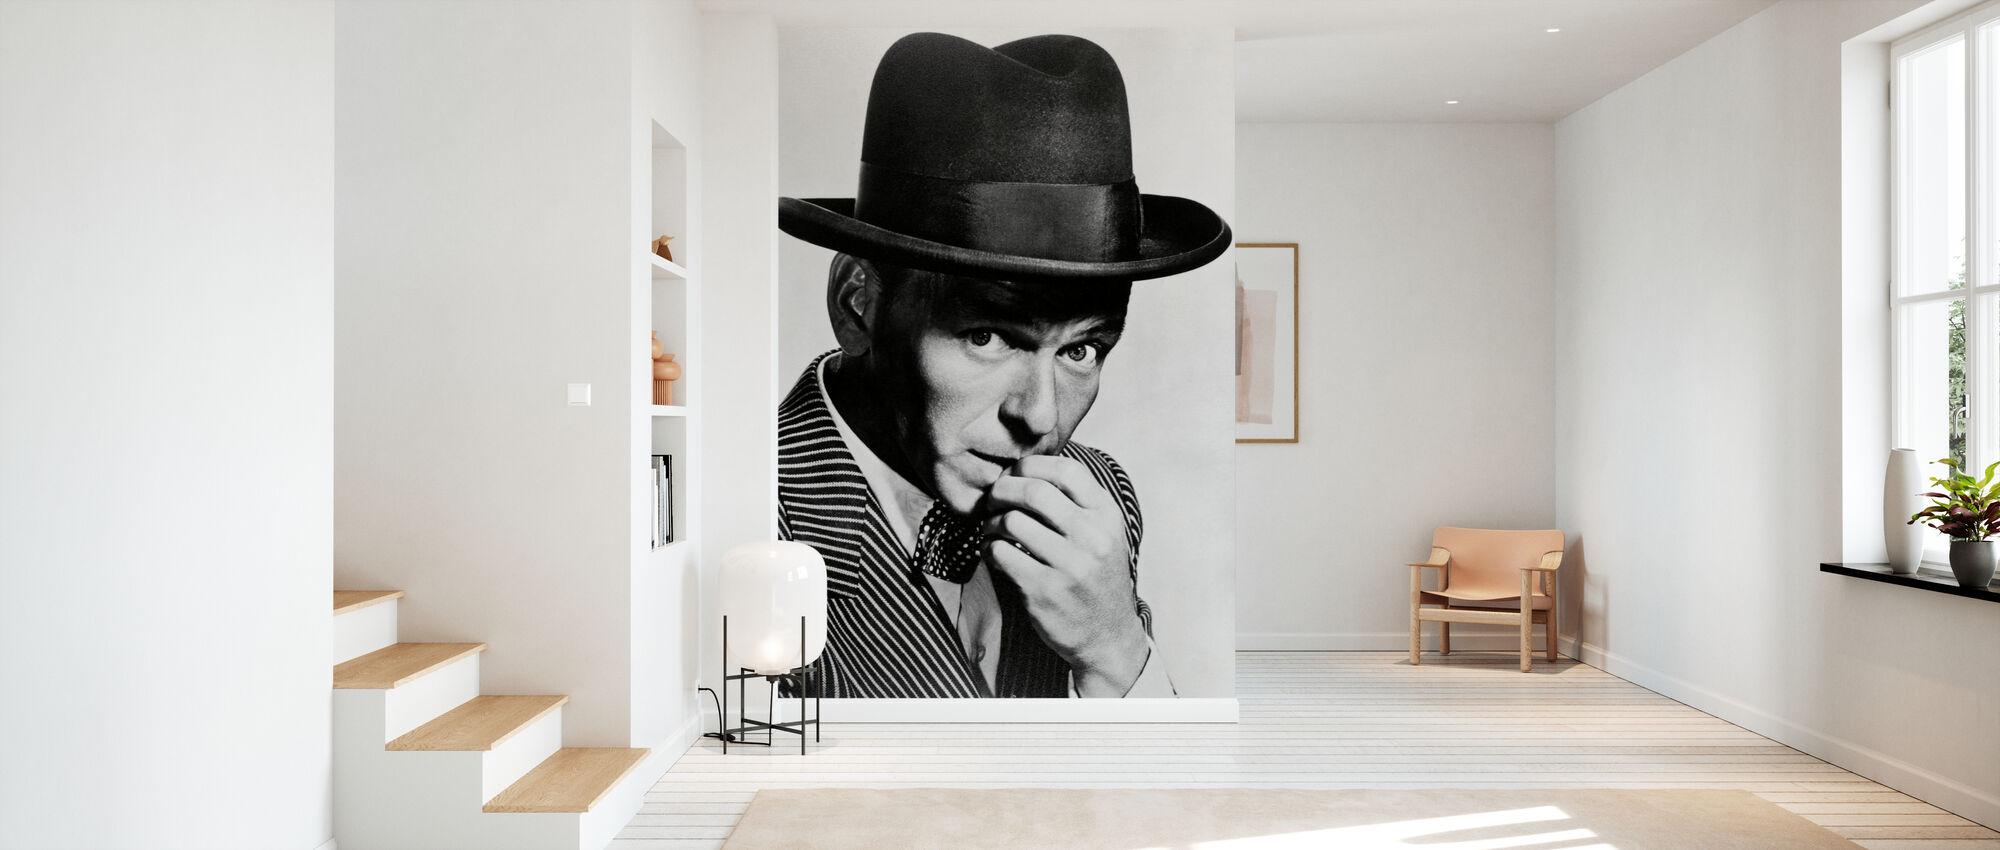 Frank Sinatra in Guys and Dolls - Wallpaper - Hallway